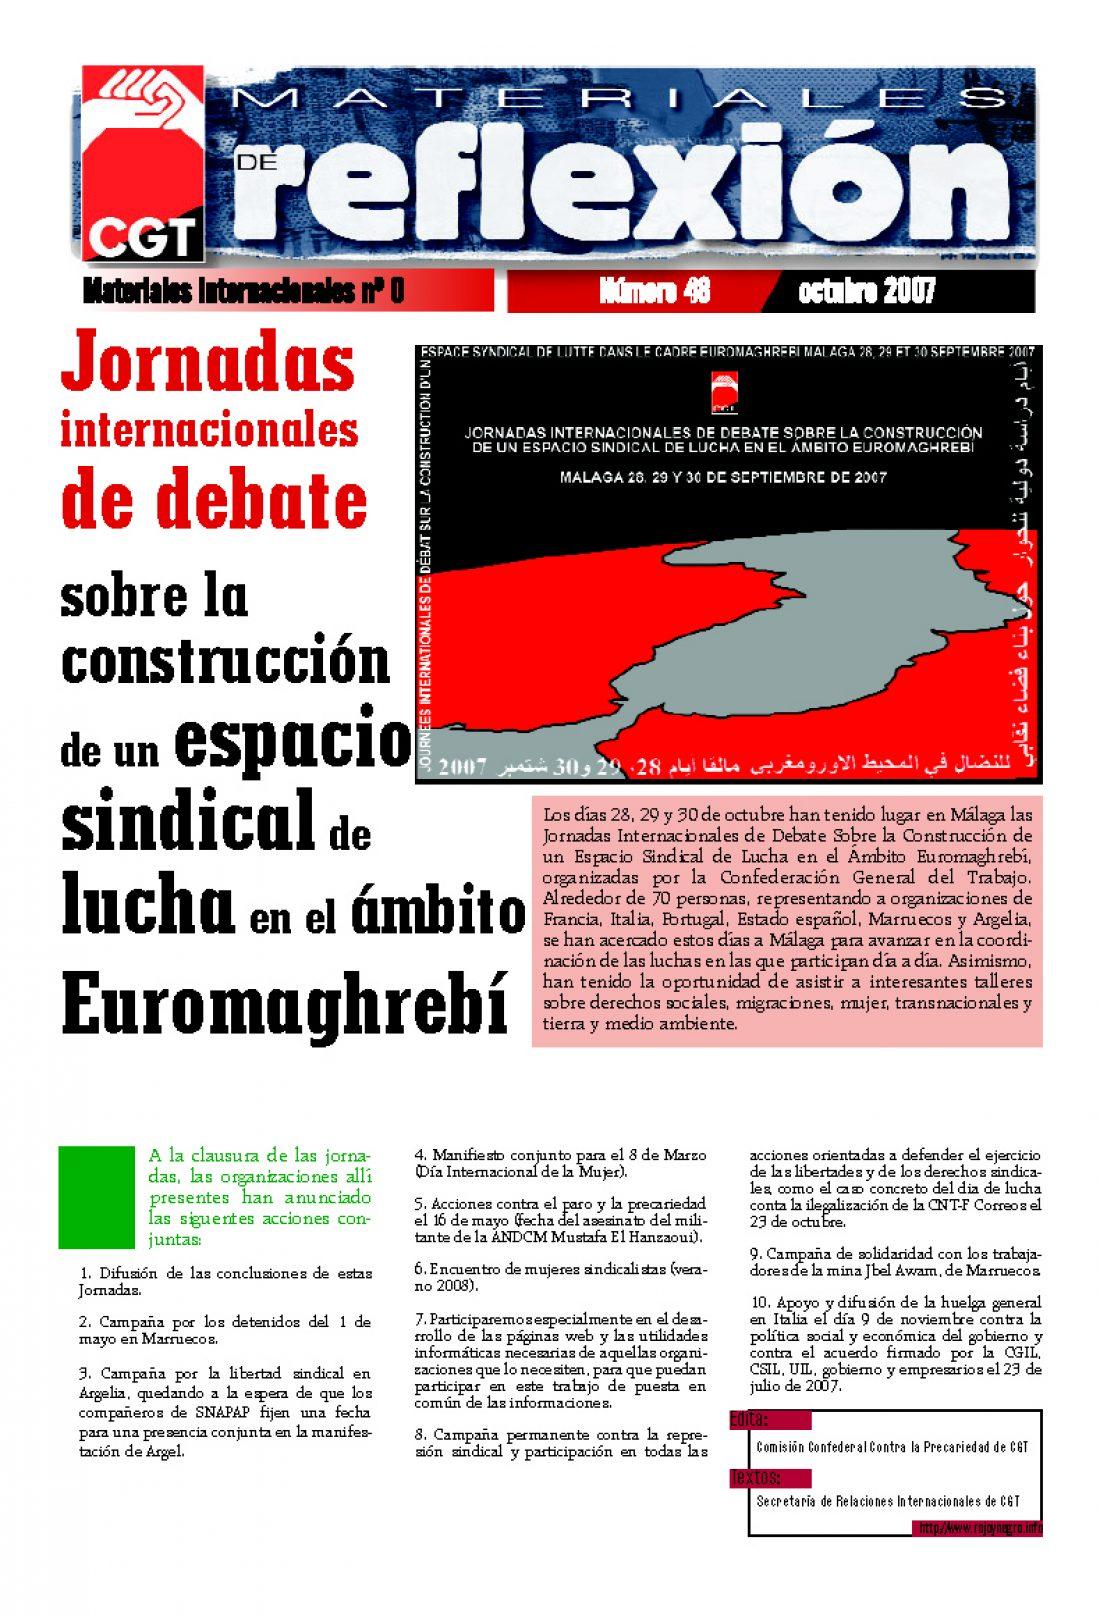 MR 48 Jornadas Internacionales Euromaghrebíes